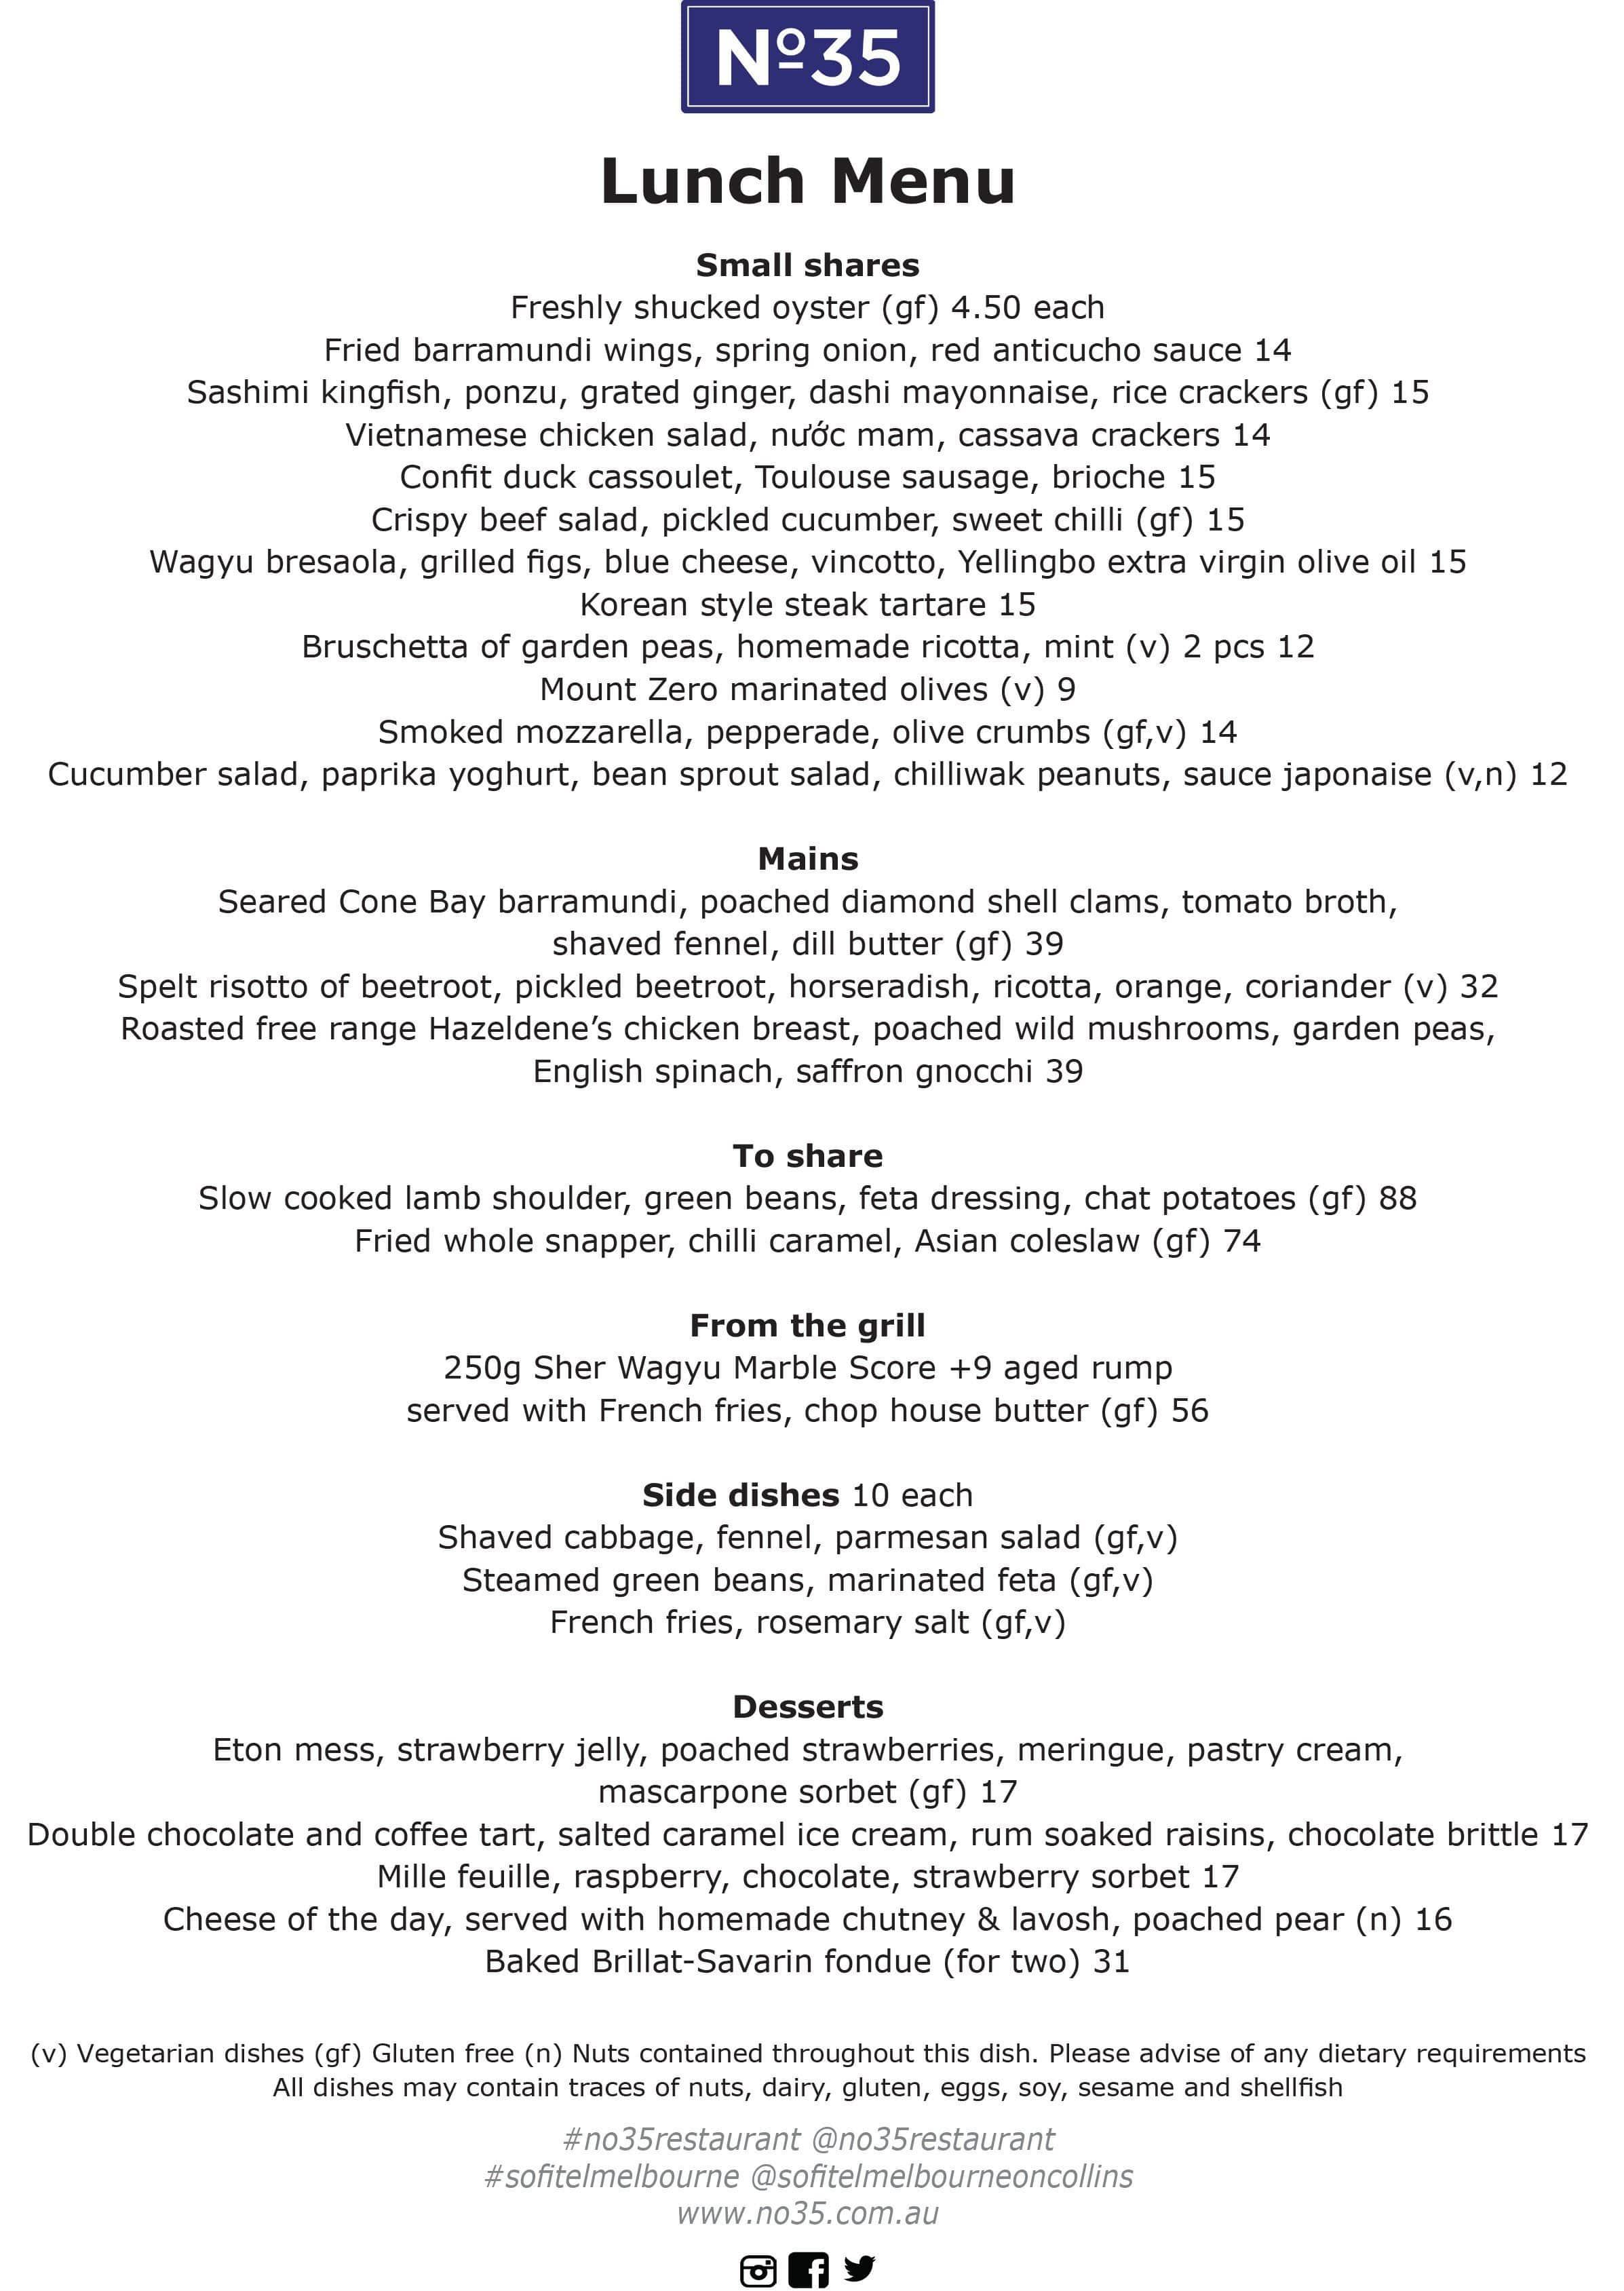 Menu at No35, Sofitel Melbourne On Collins - Restaurant prices